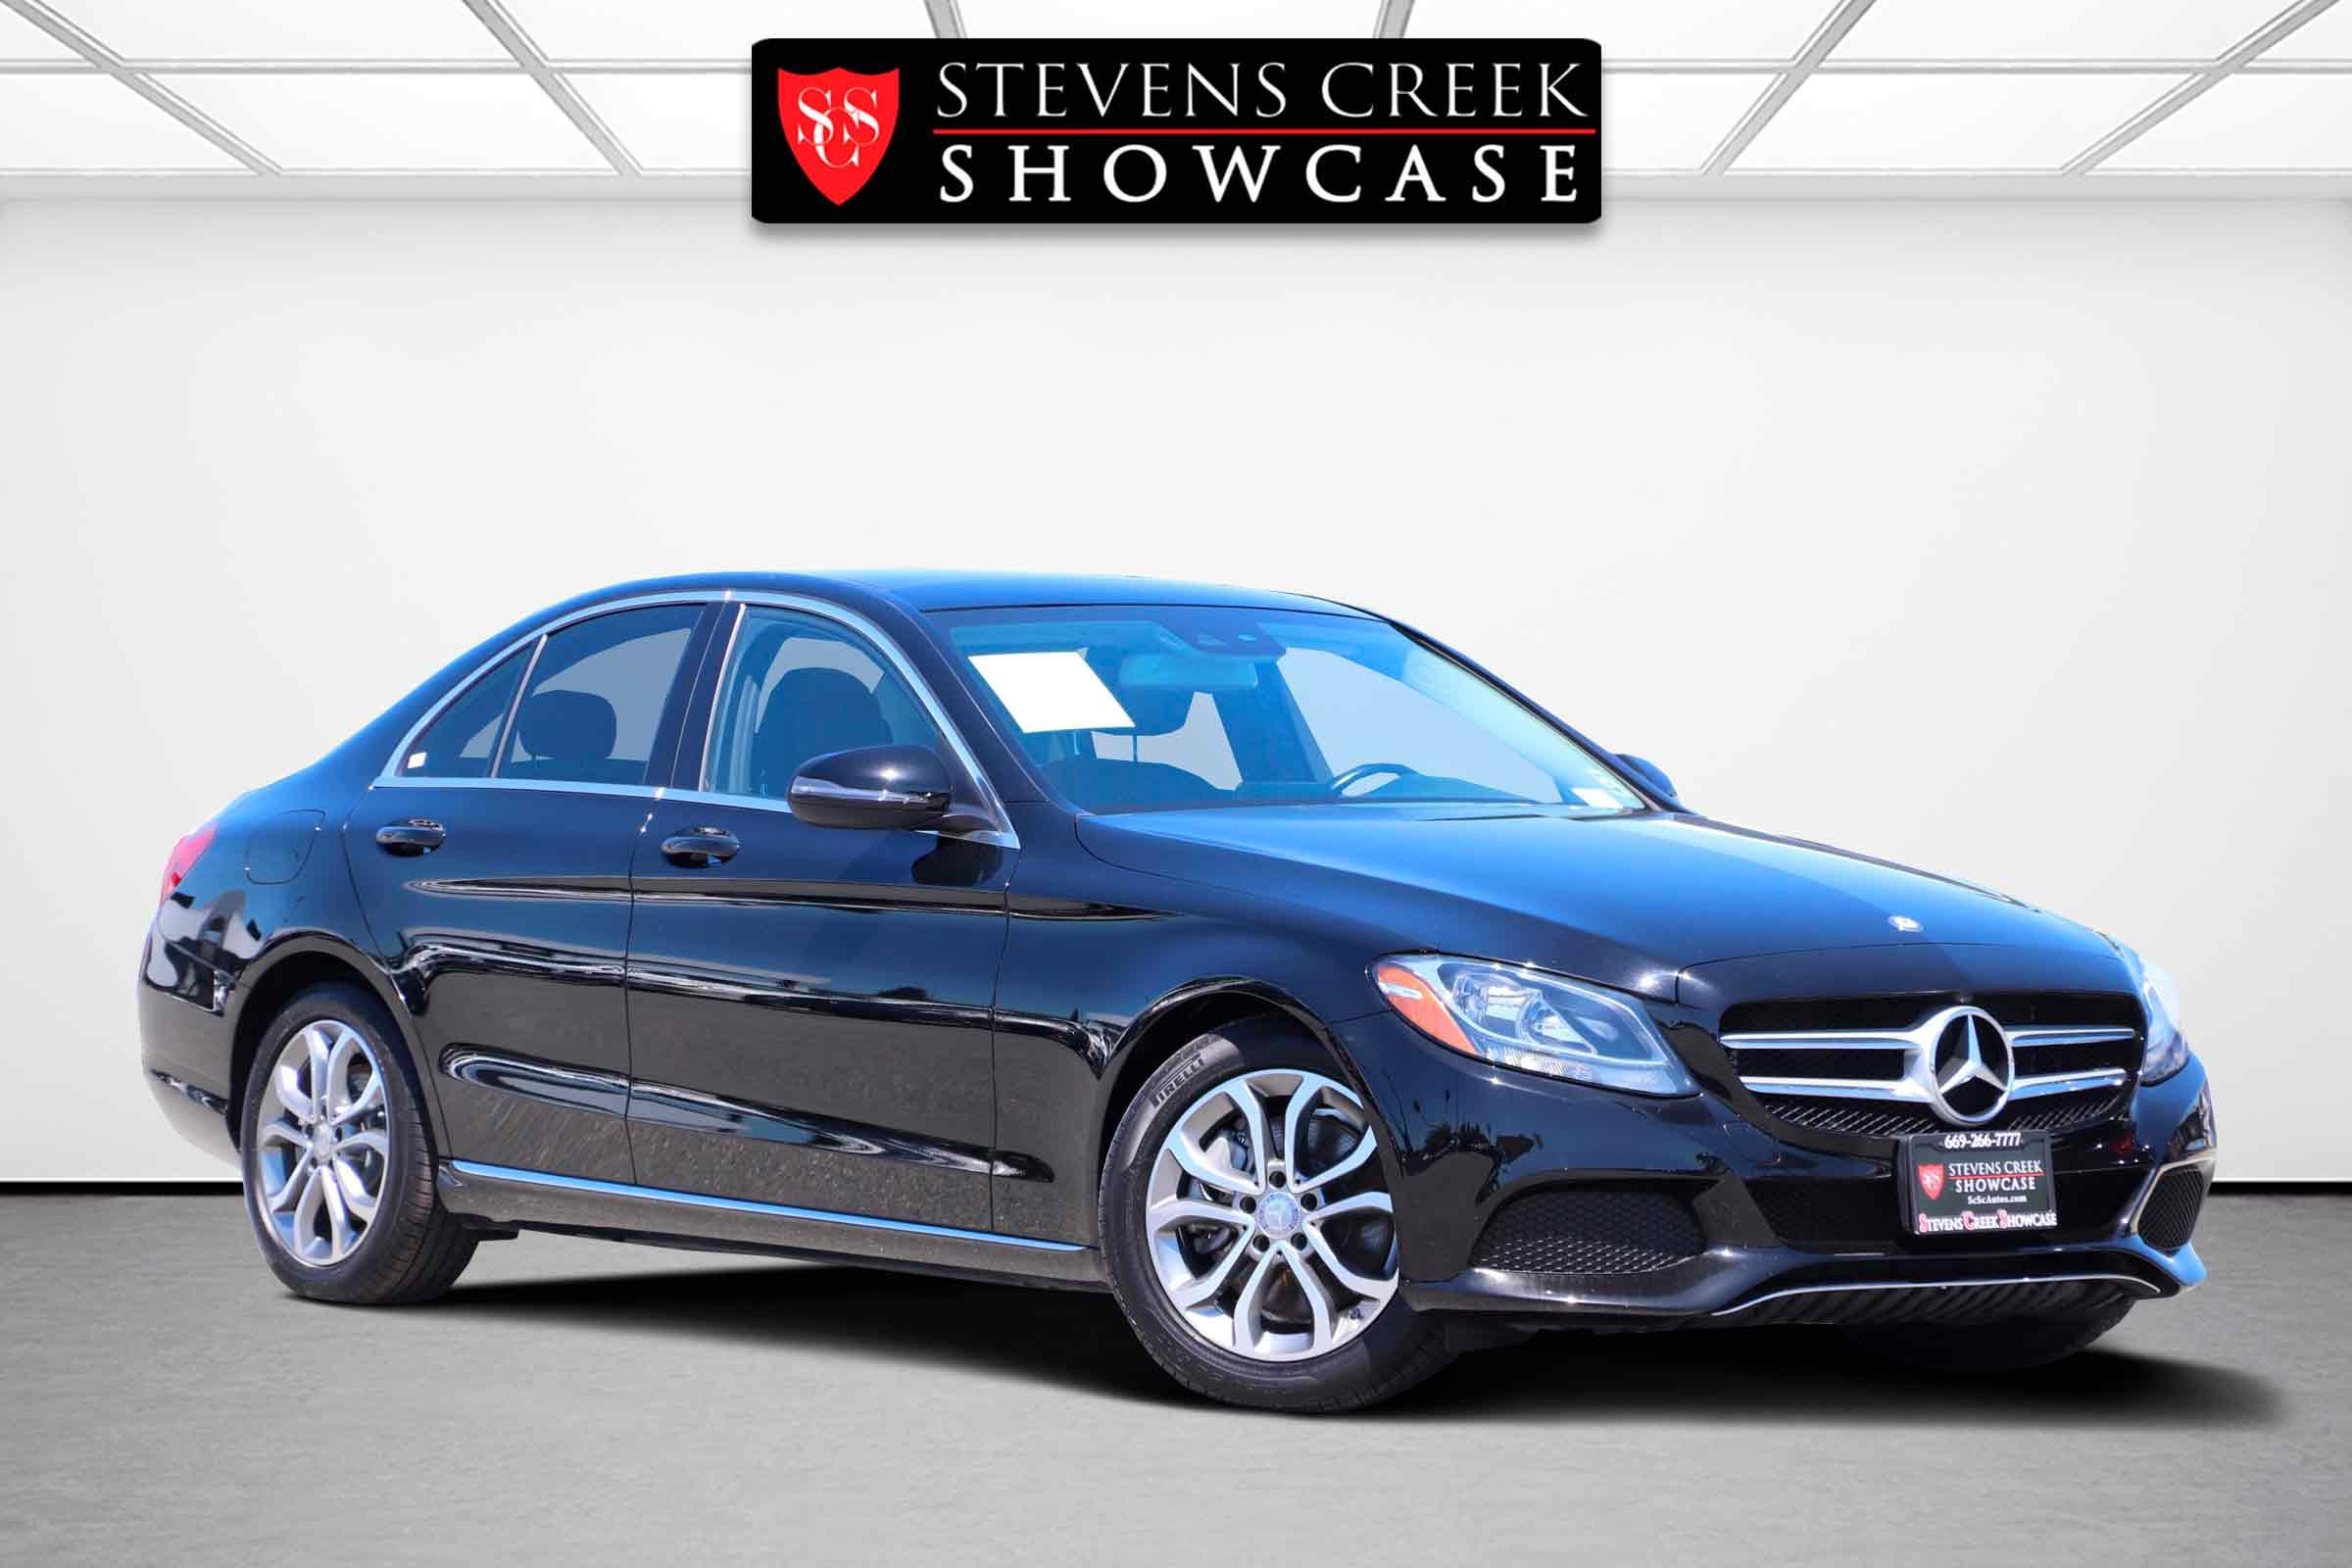 Mercedes Stevens Creek >> 2016 Mercedes Benz C 300 Sedan Stevens Creek Showcase